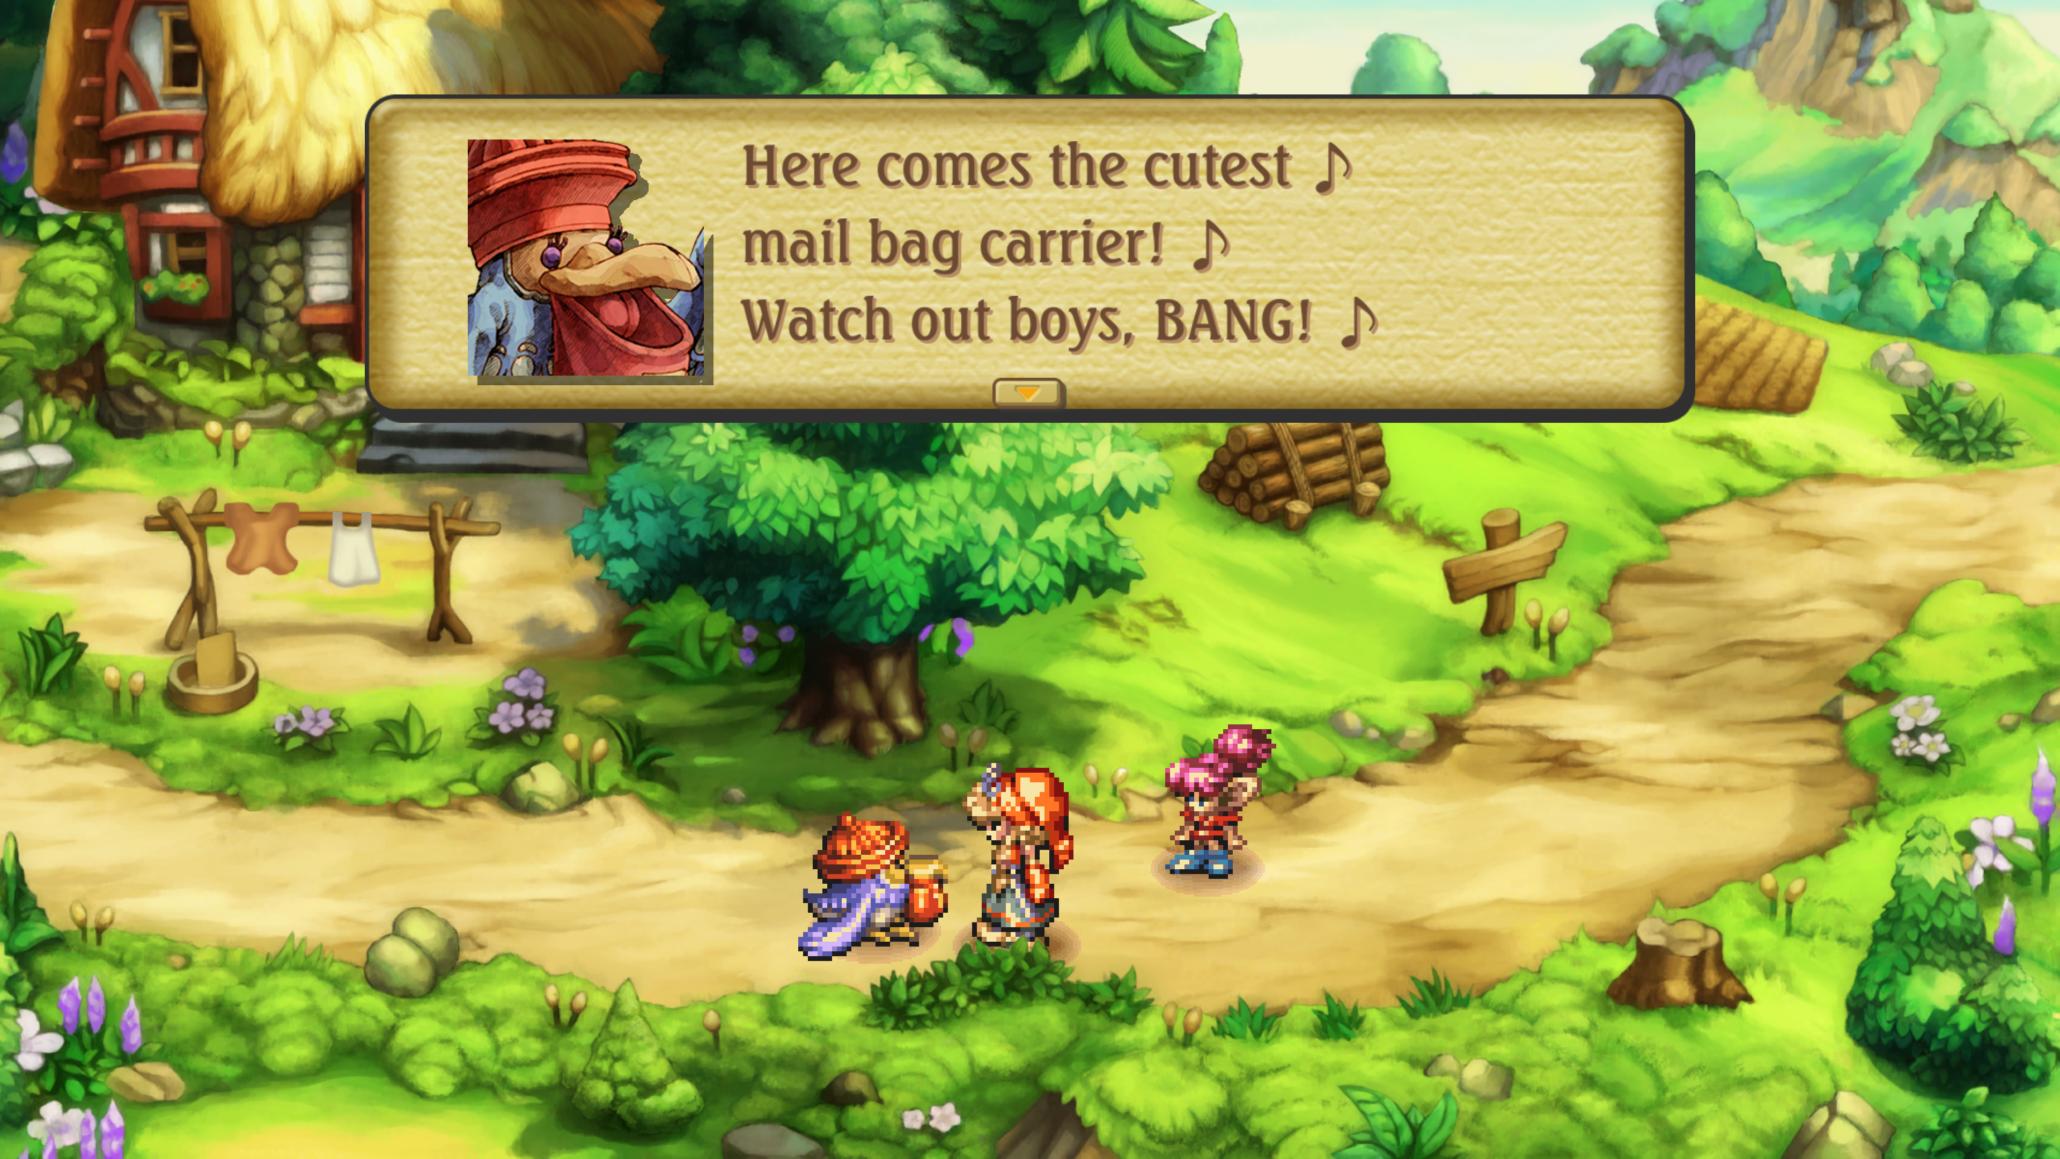 legend-of-mana-mail